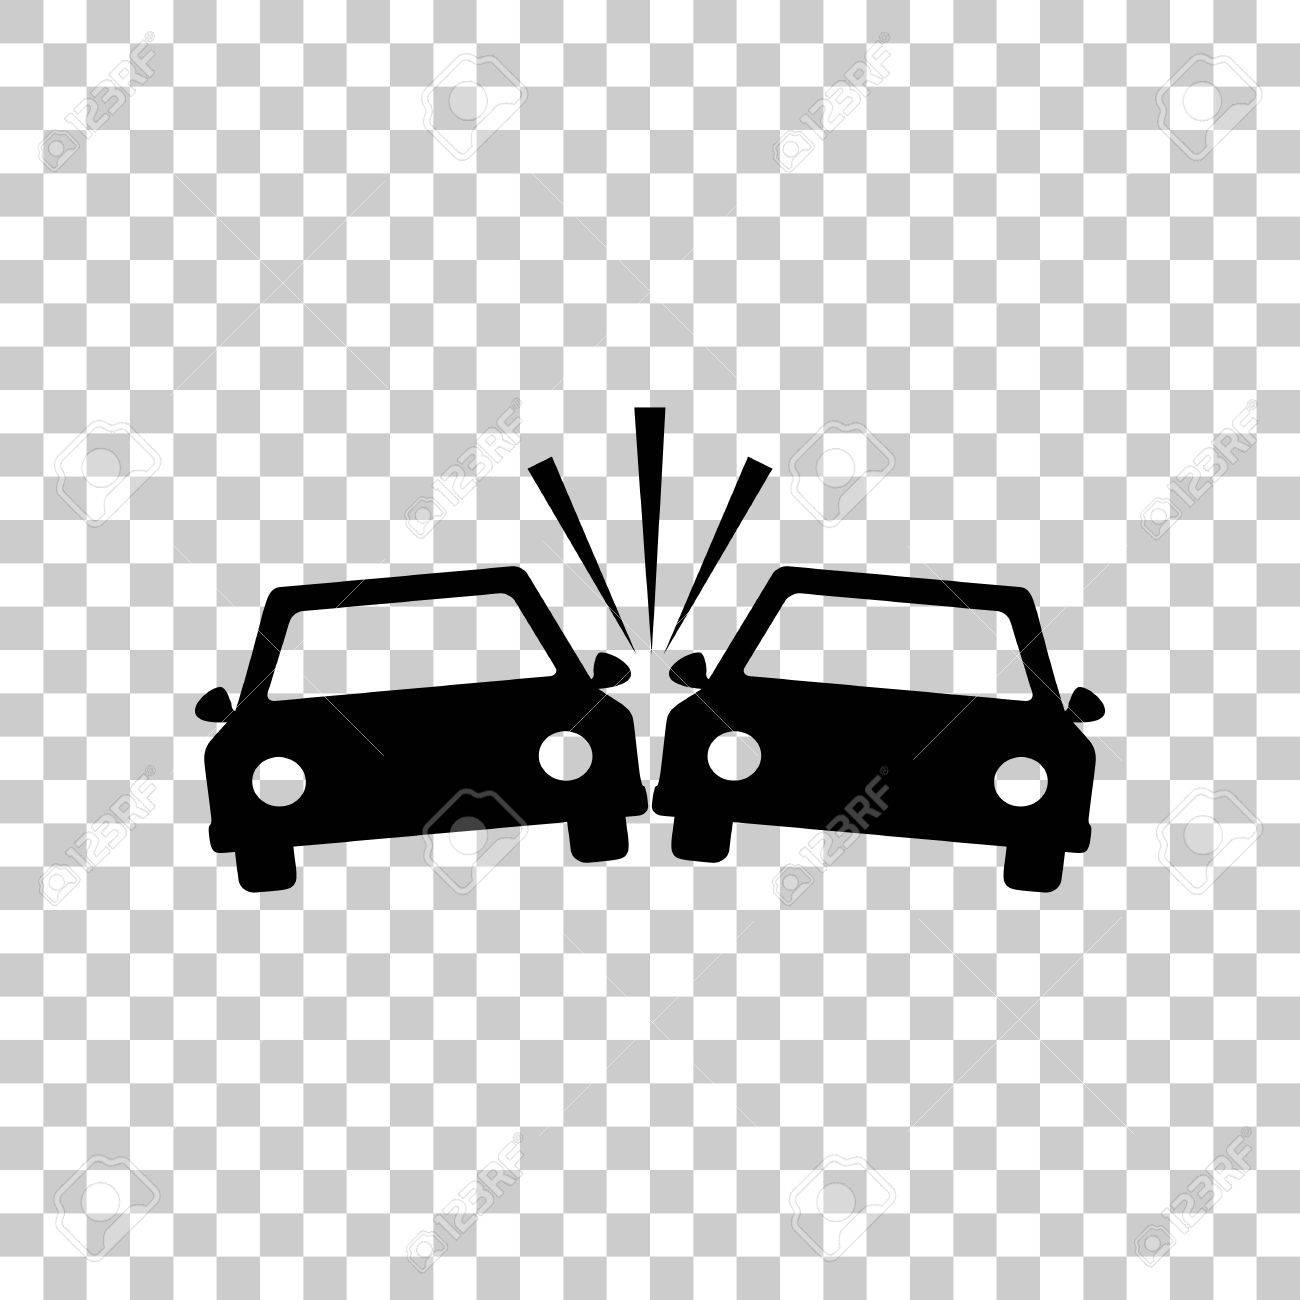 Crashed Cars sign. Black icon on transparent background..